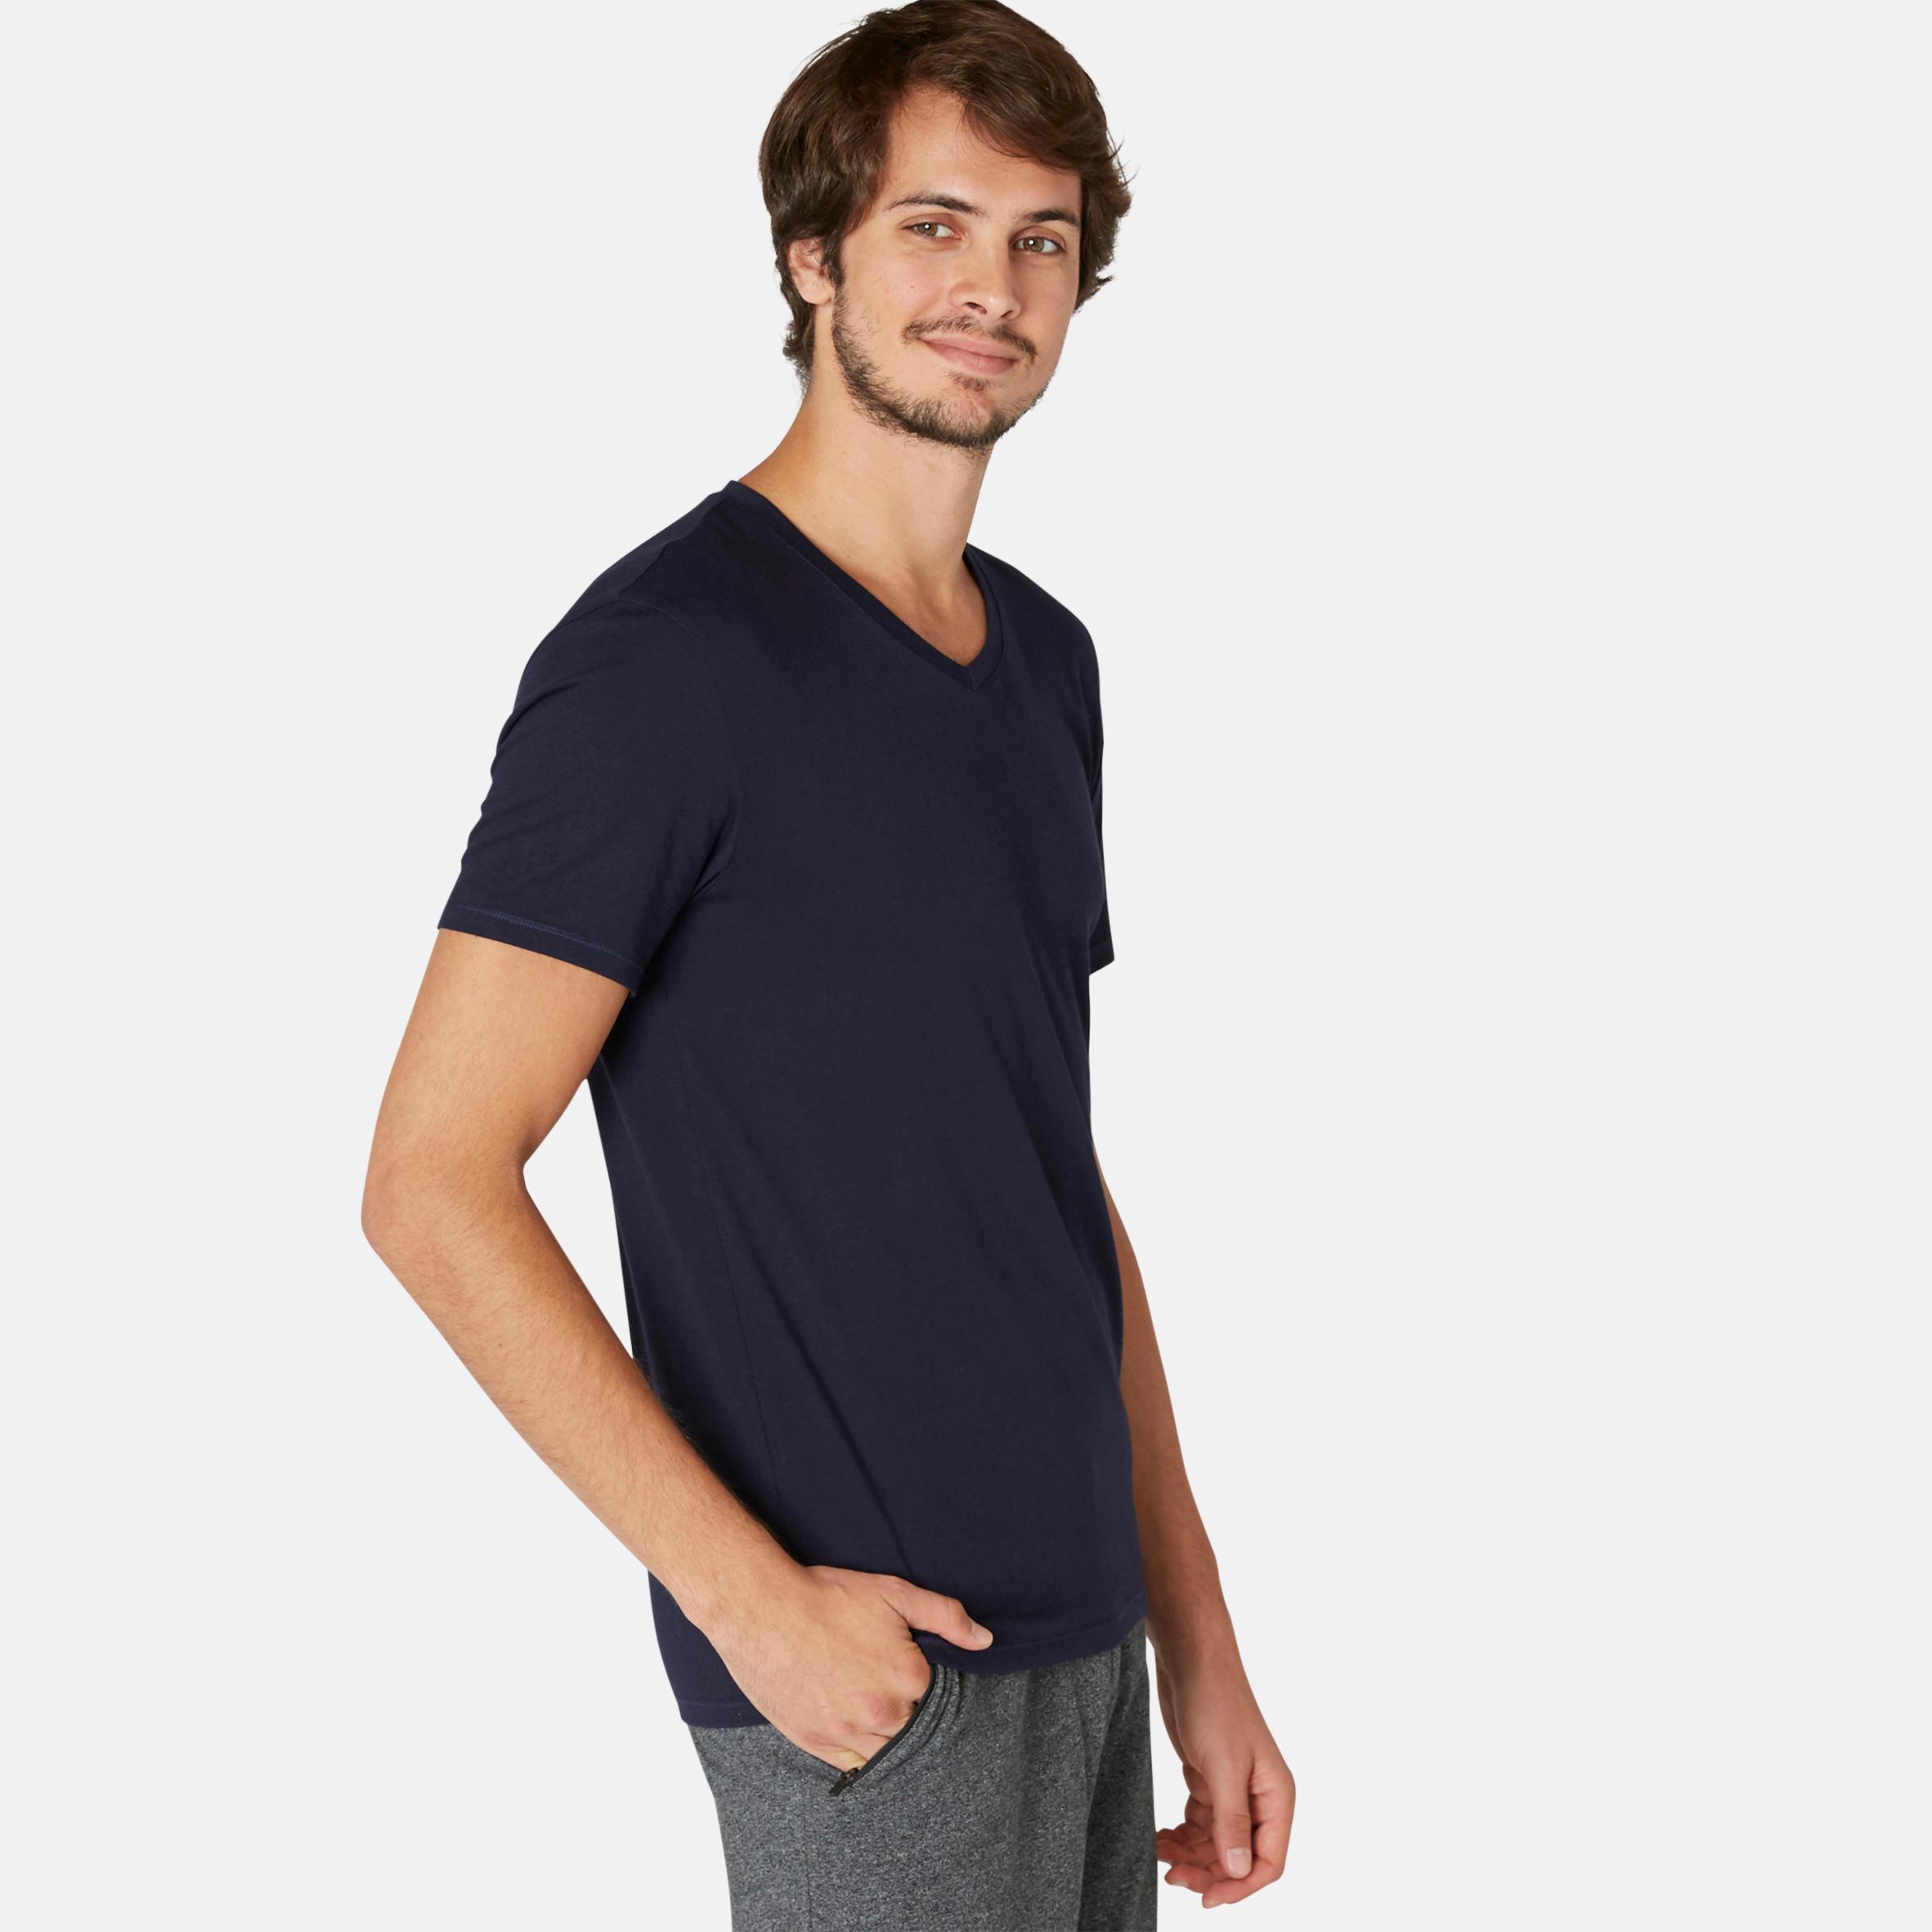 Tricou slim 500 bărbați imagine produs